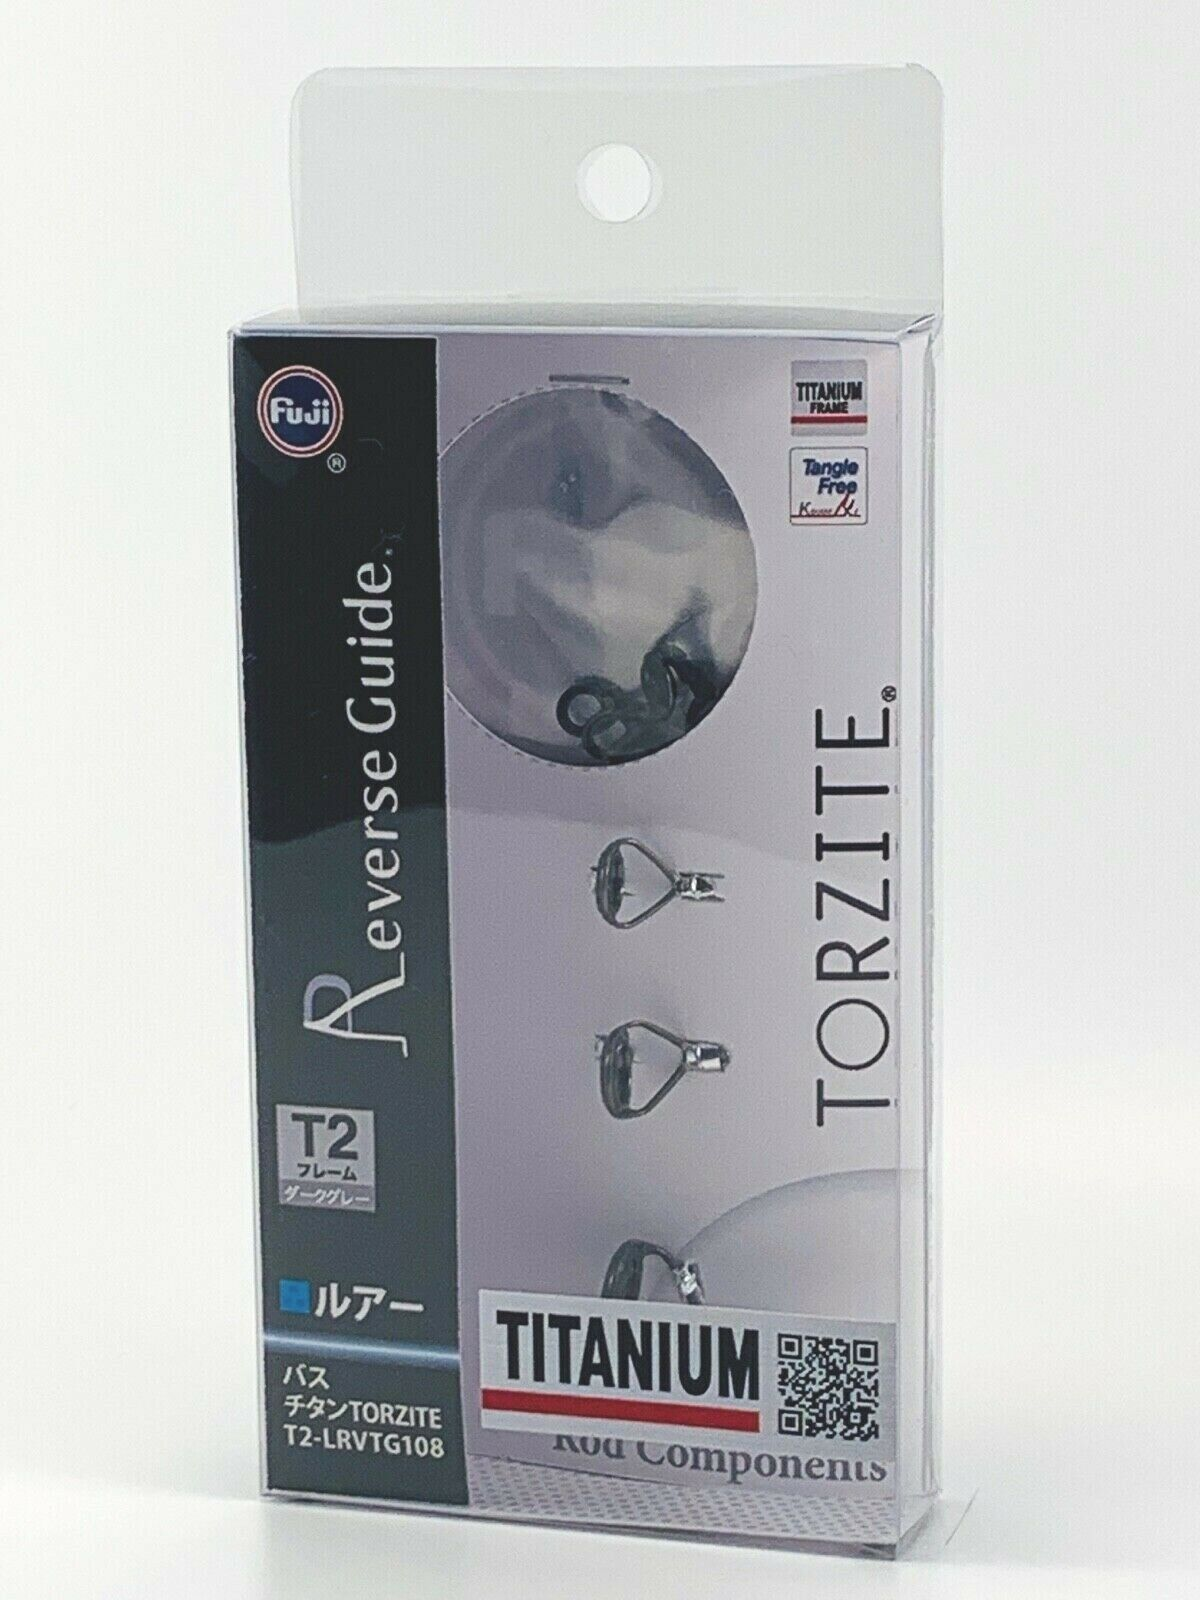 Fuji original Titanium TORZITE bait casting Guides Set T2-LRVTG108 Libre SHIPPING